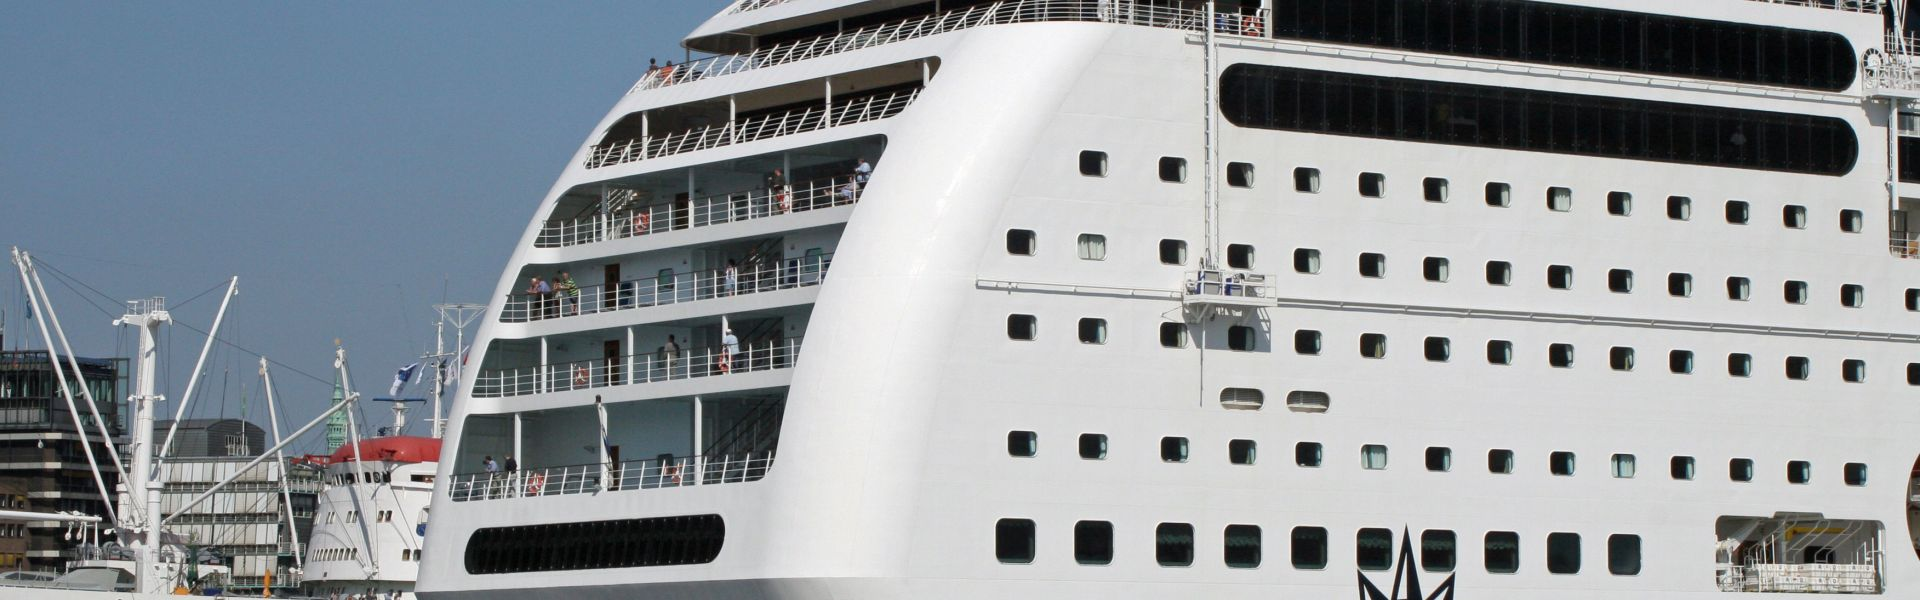 Croaziera 2018/2019 - Orientul Mijlociu si India (Dubai) - MSC Cruises - MSC Lirica - 14 nopti